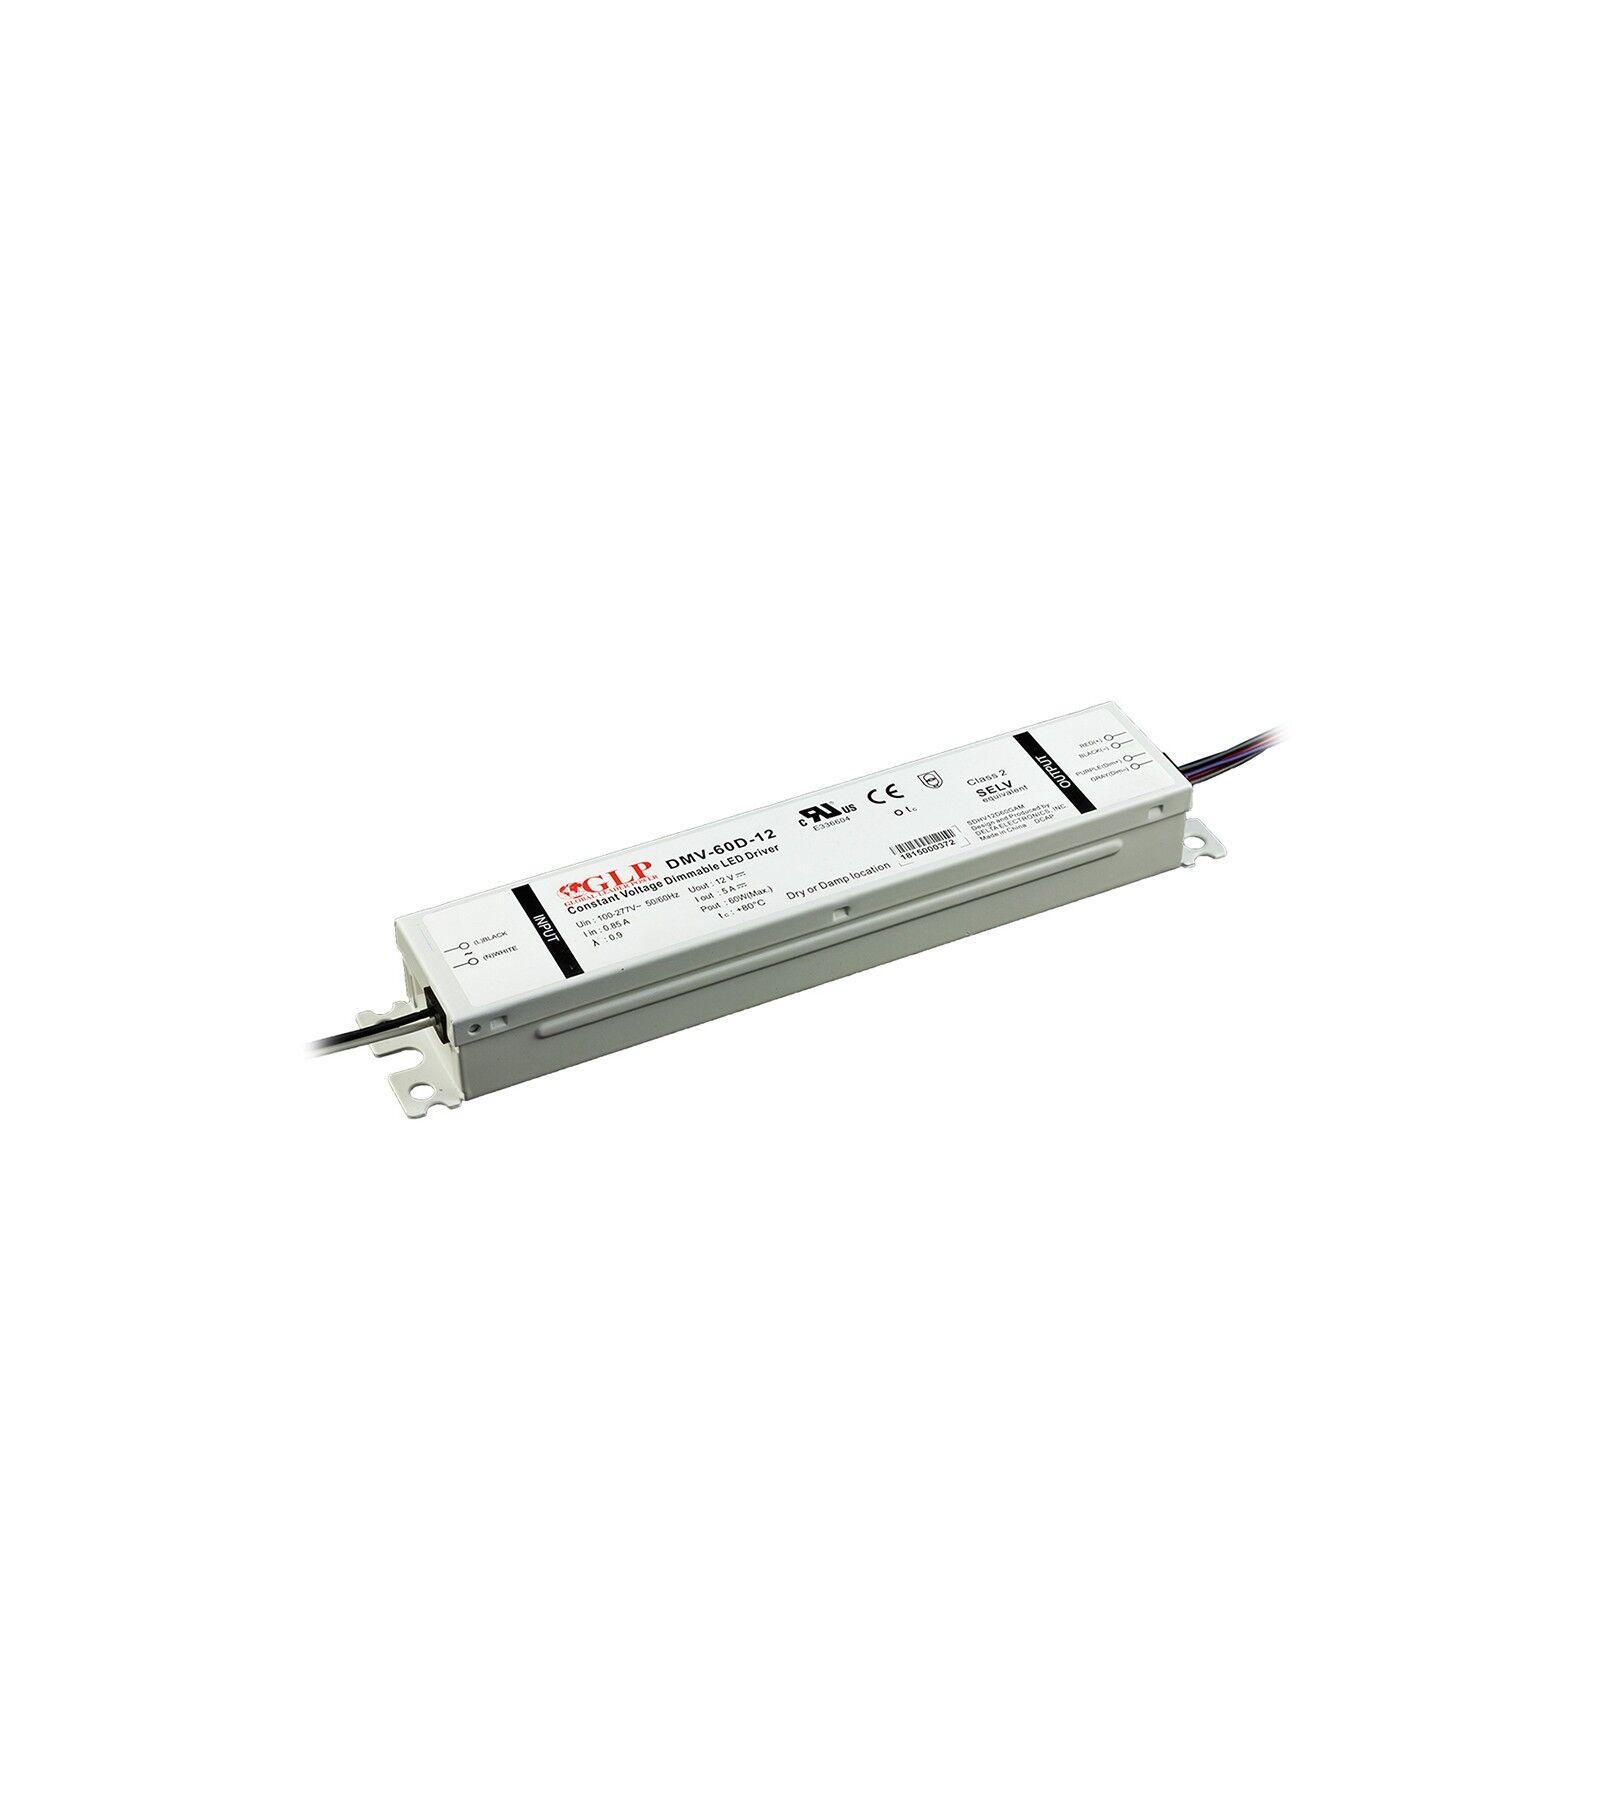 GLP Transformateur spécial Led 12V de 60W DIMMABLE Etanche IP54 DMV-60D GLP - GLP-DMV-60D